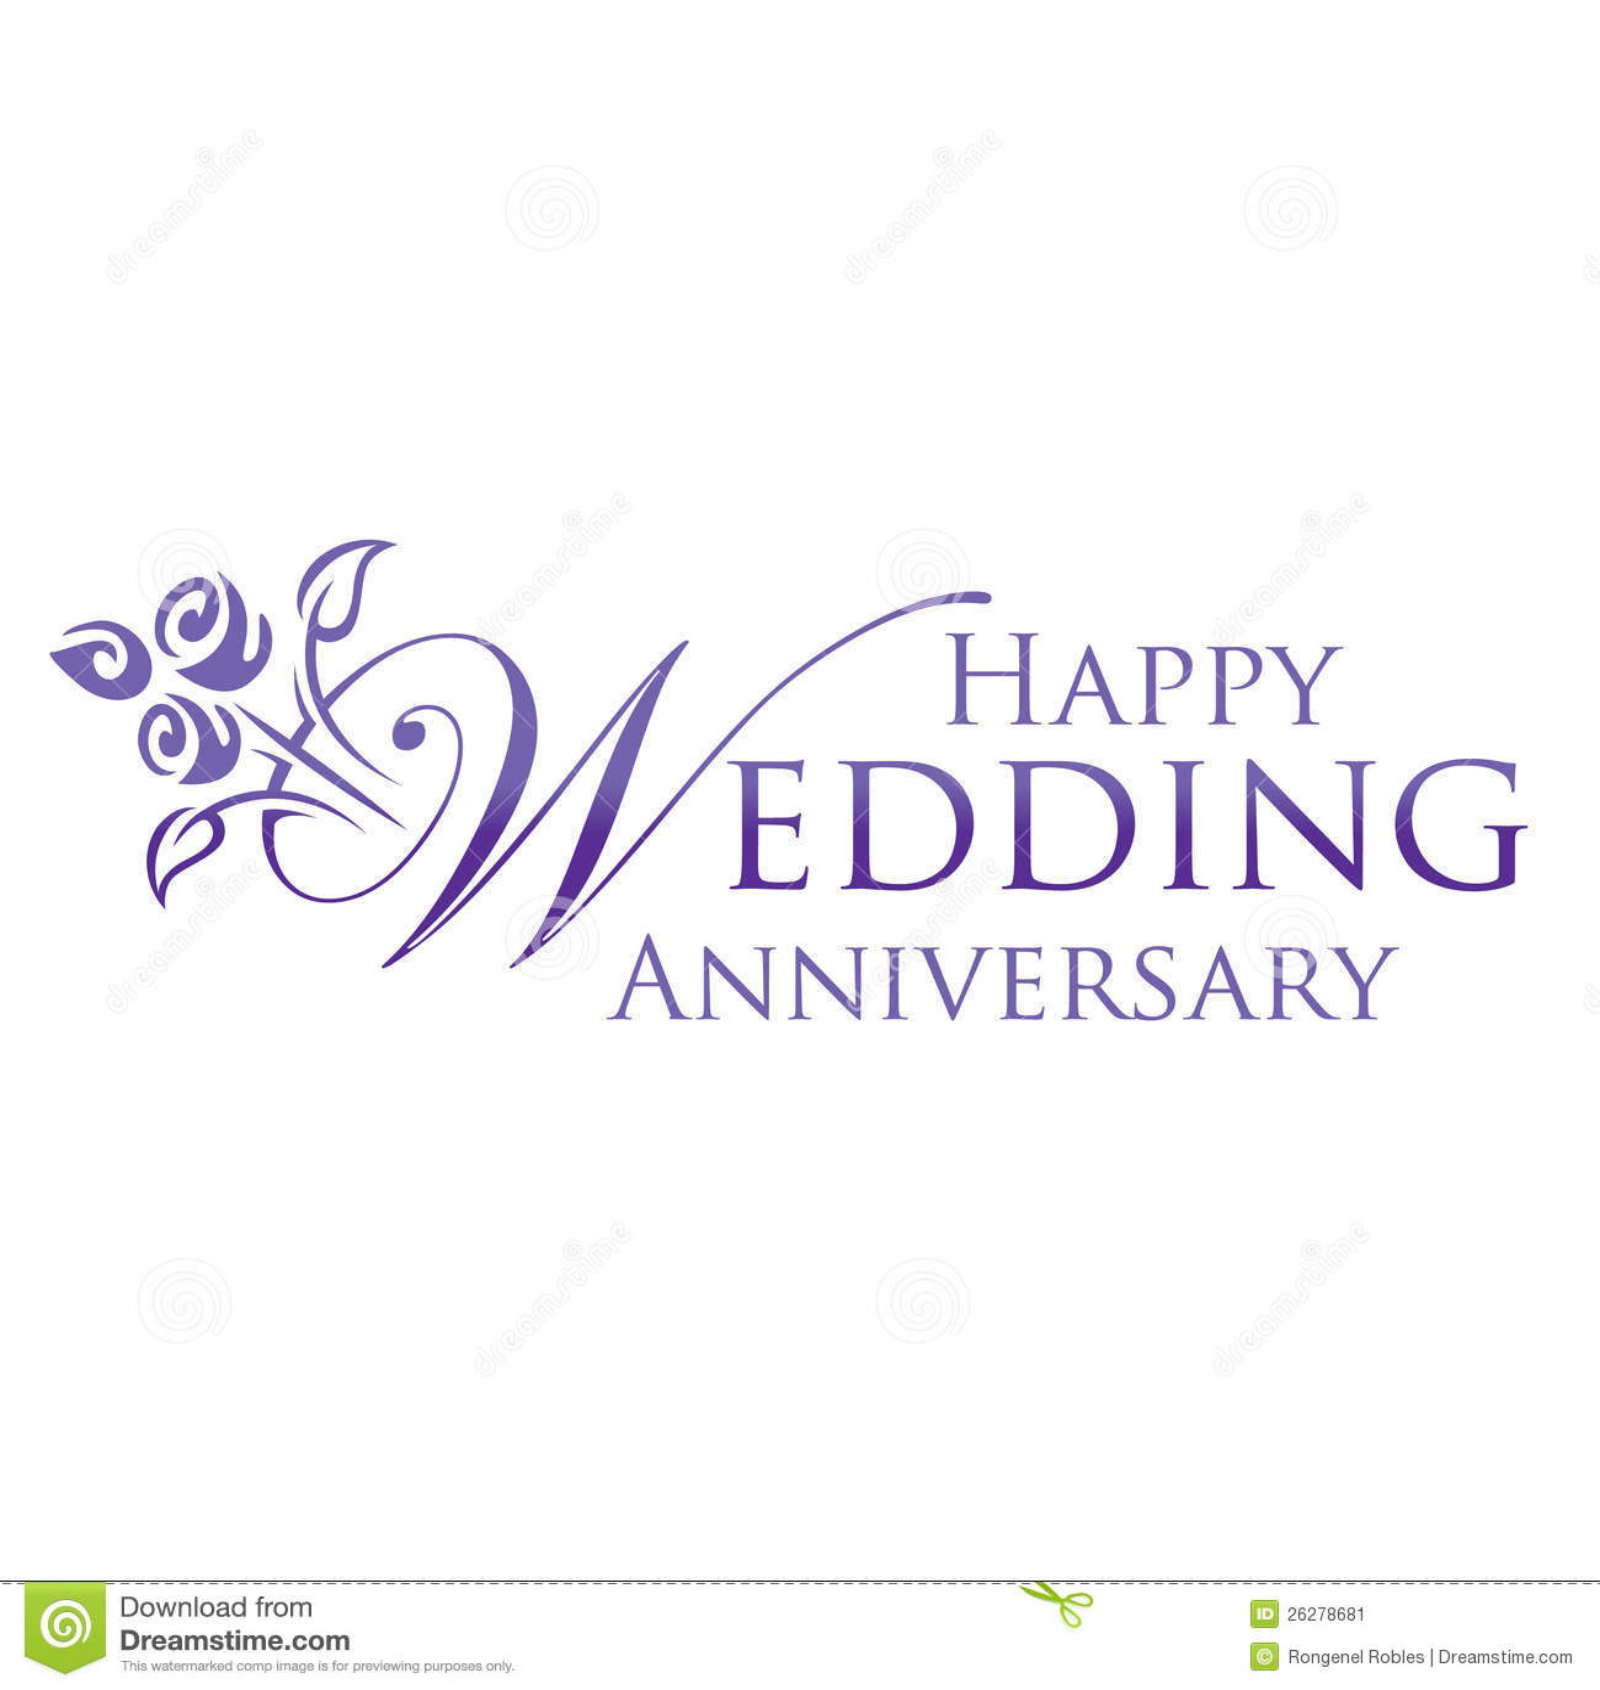 50th wedding anniversary logo design happy wedding anniversary